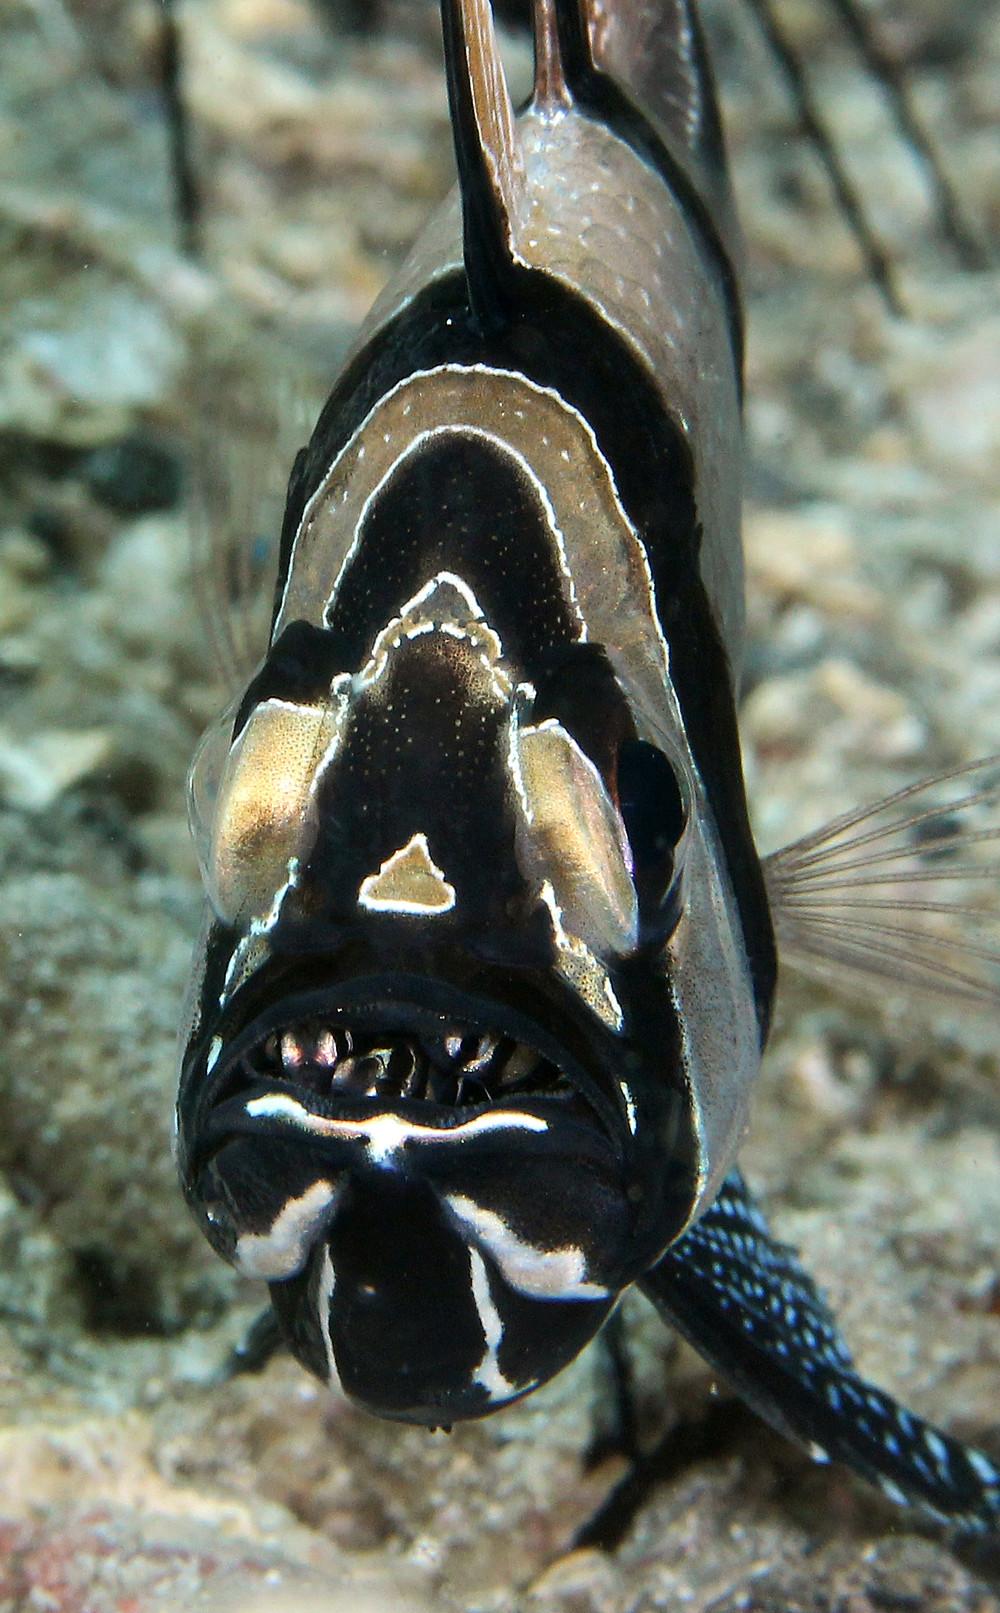 Bangai Cardinalfish with Juvenile in his mouth